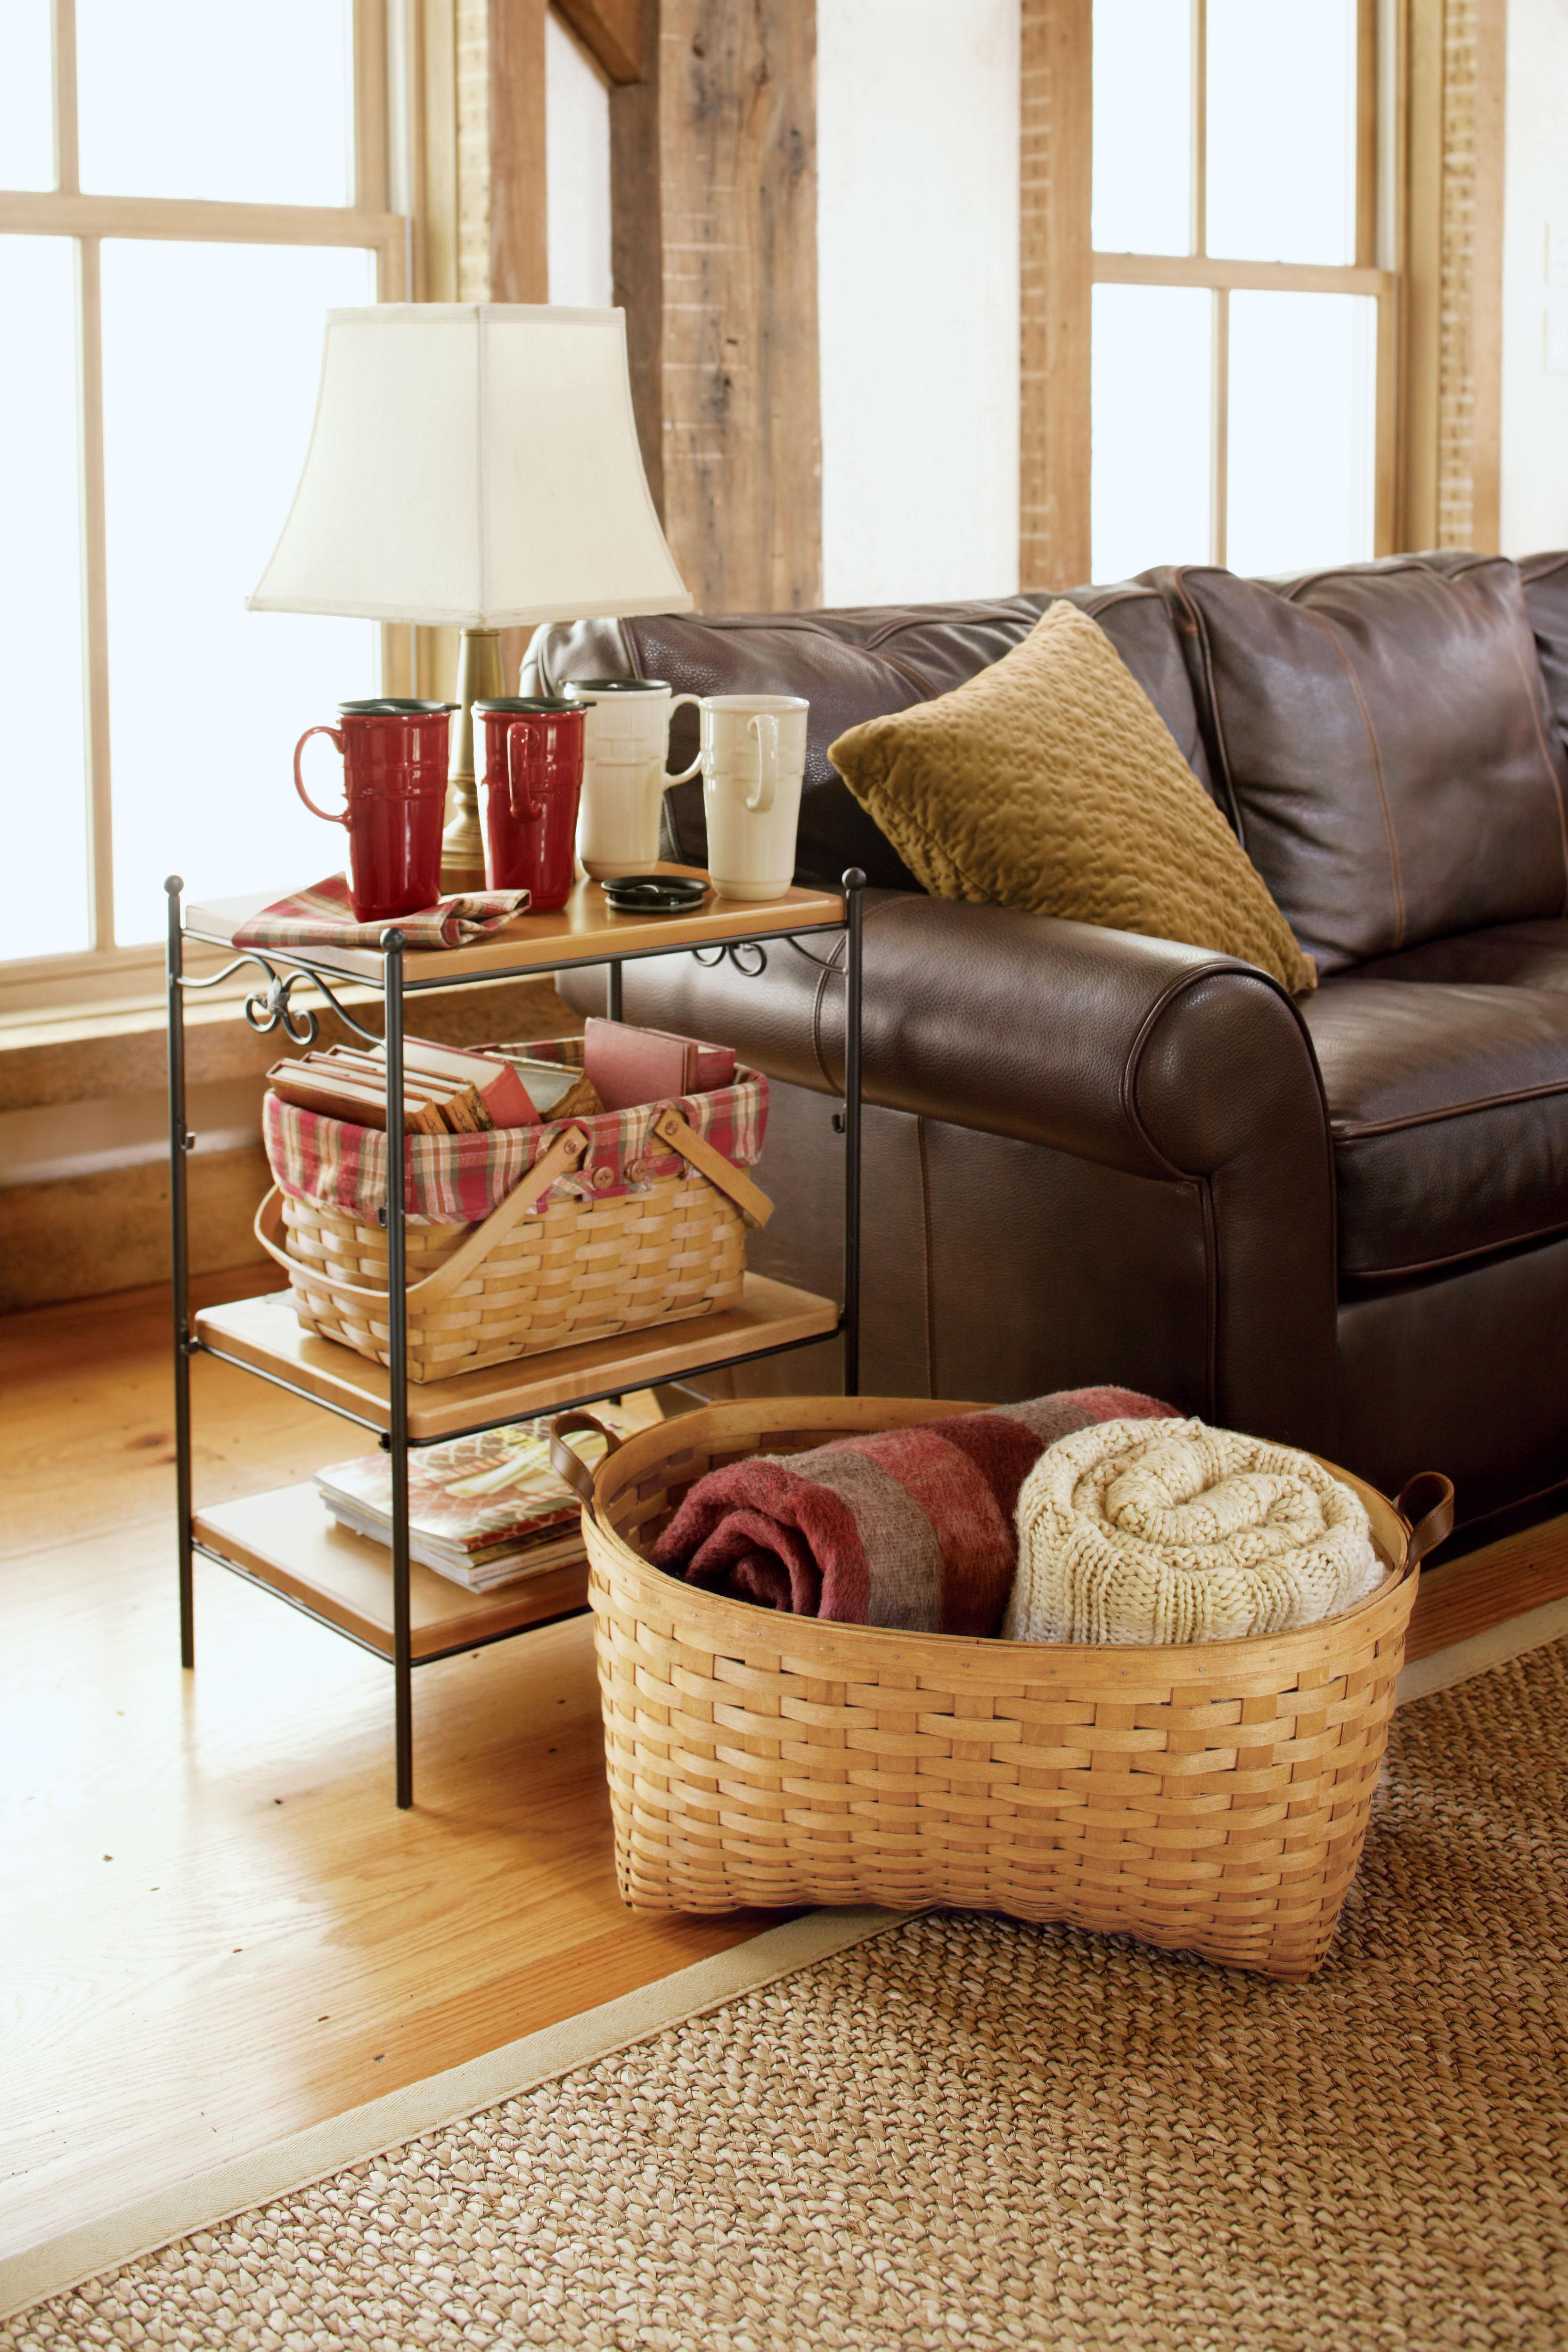 title | Living Room Blanket Storage Ideas